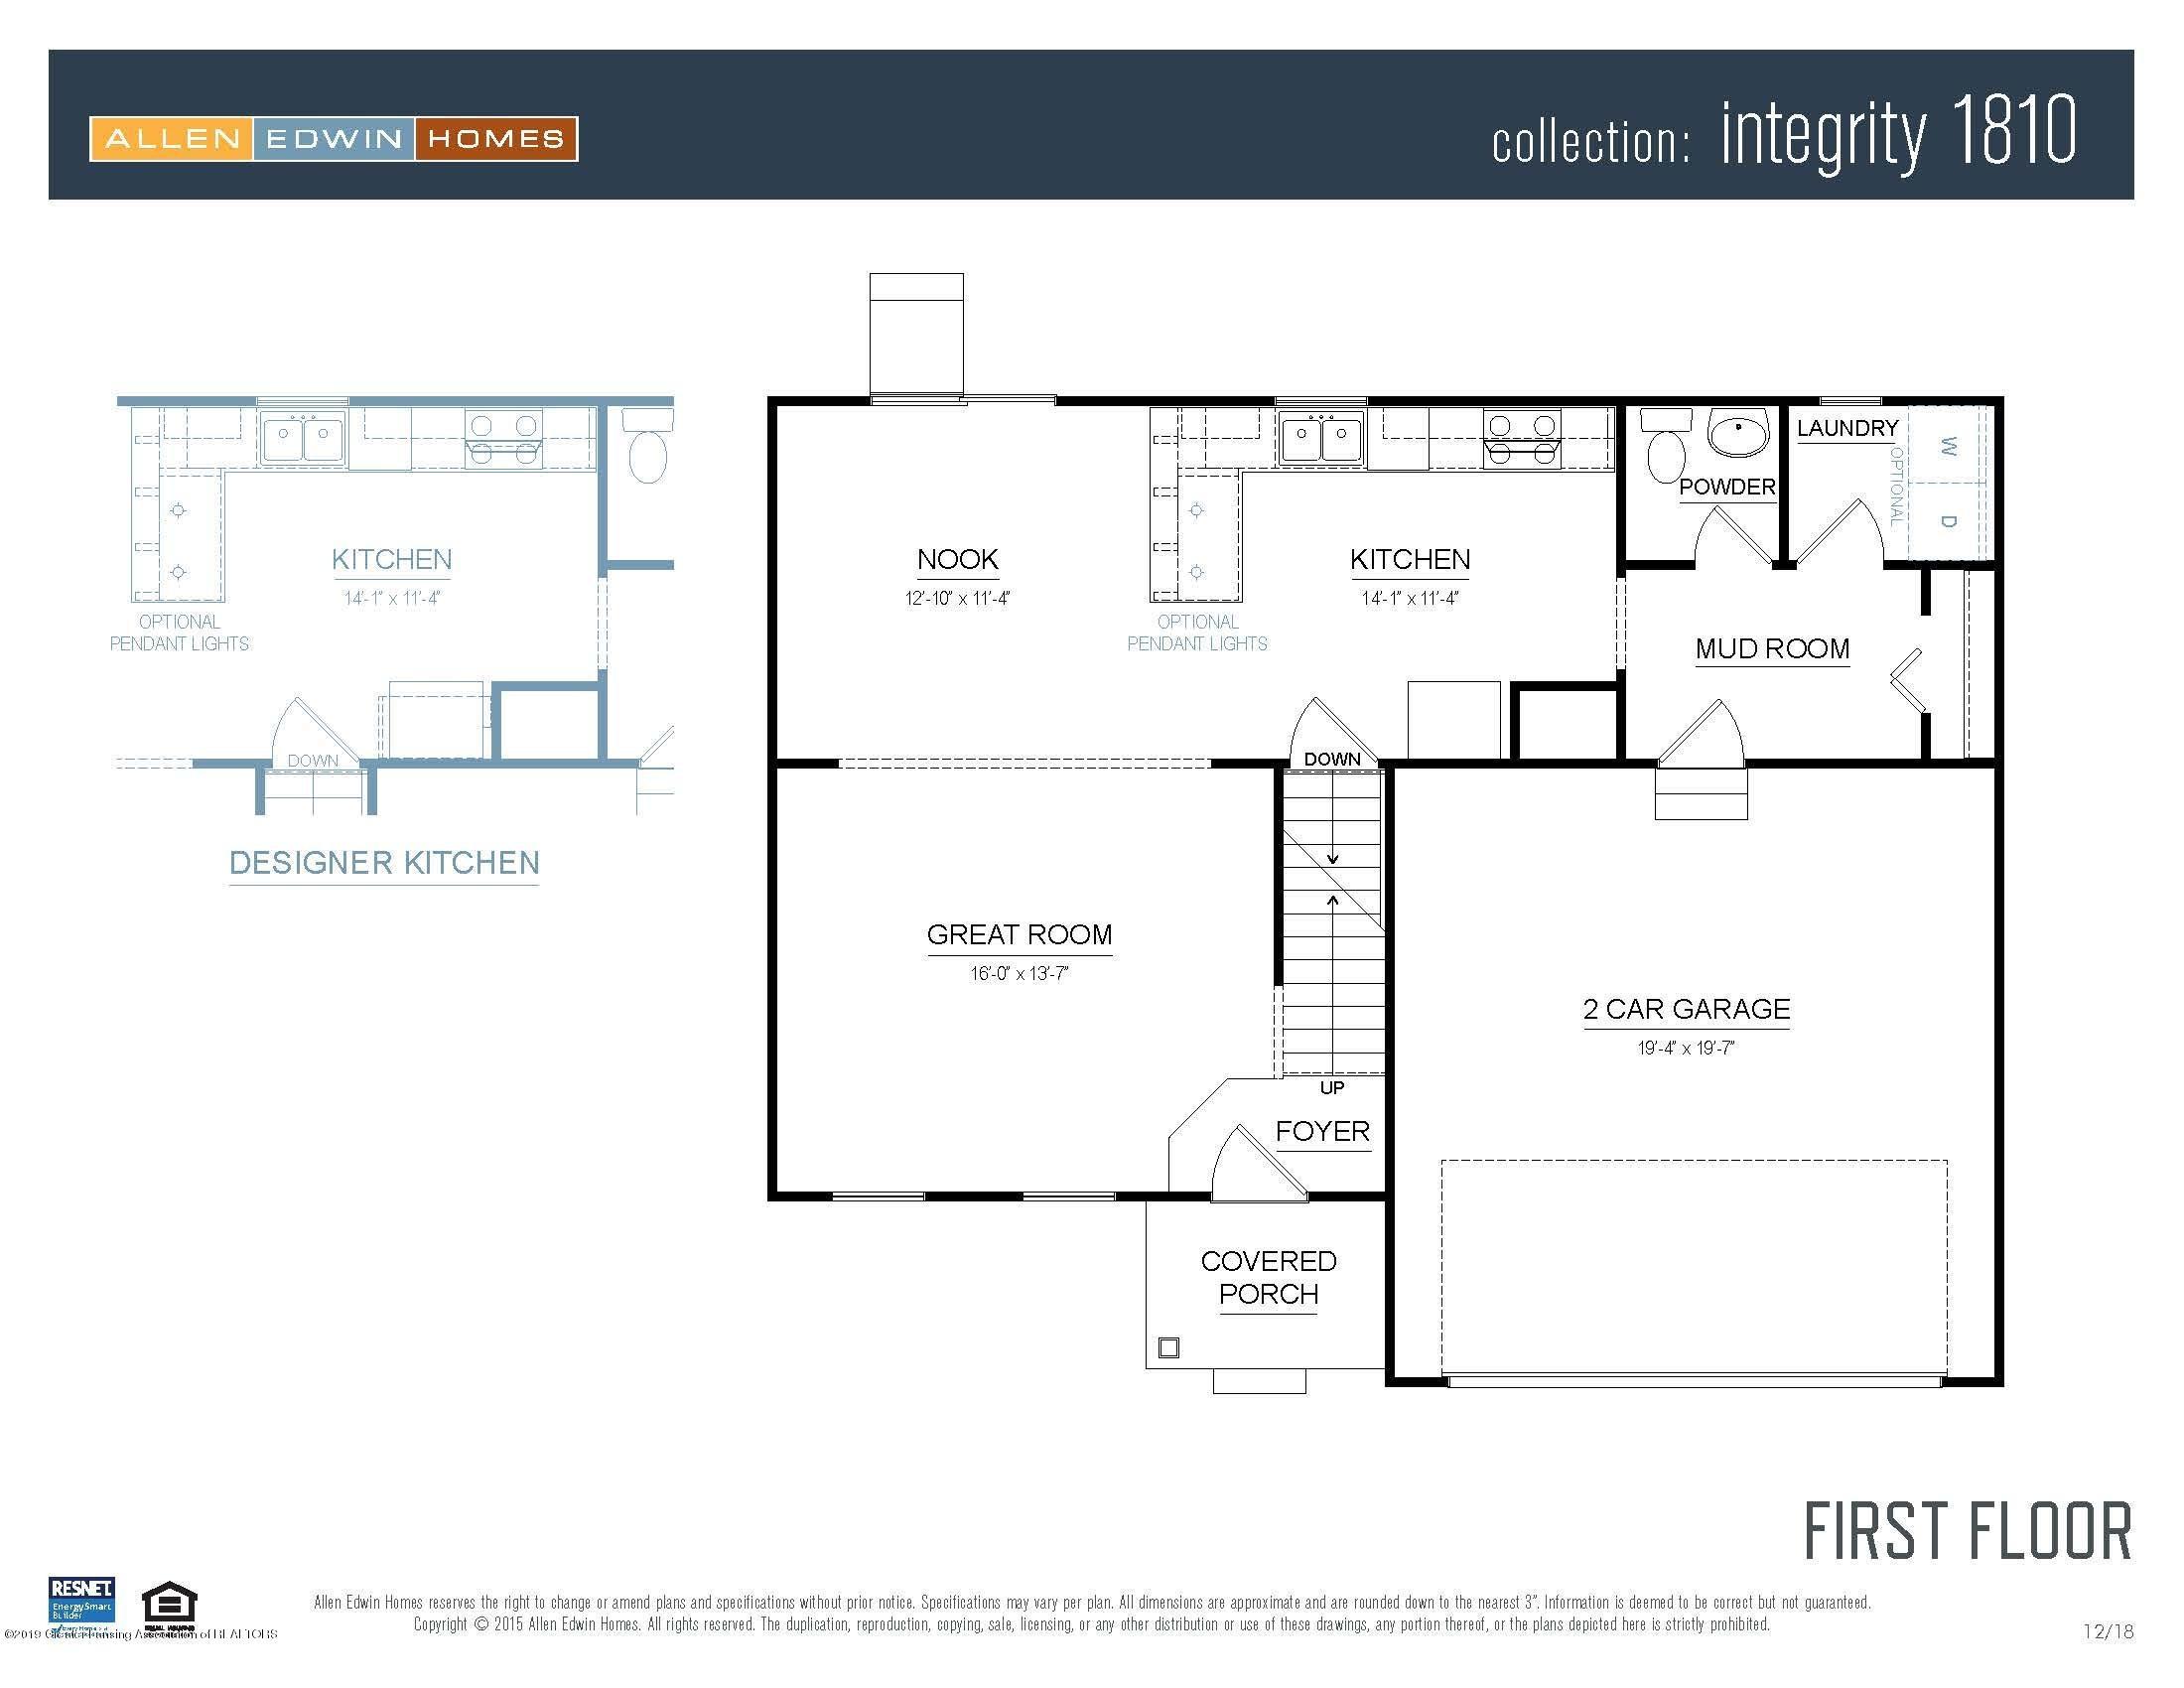 236 Noleigh - Integrity 1810 V8.0a First Floor - 2